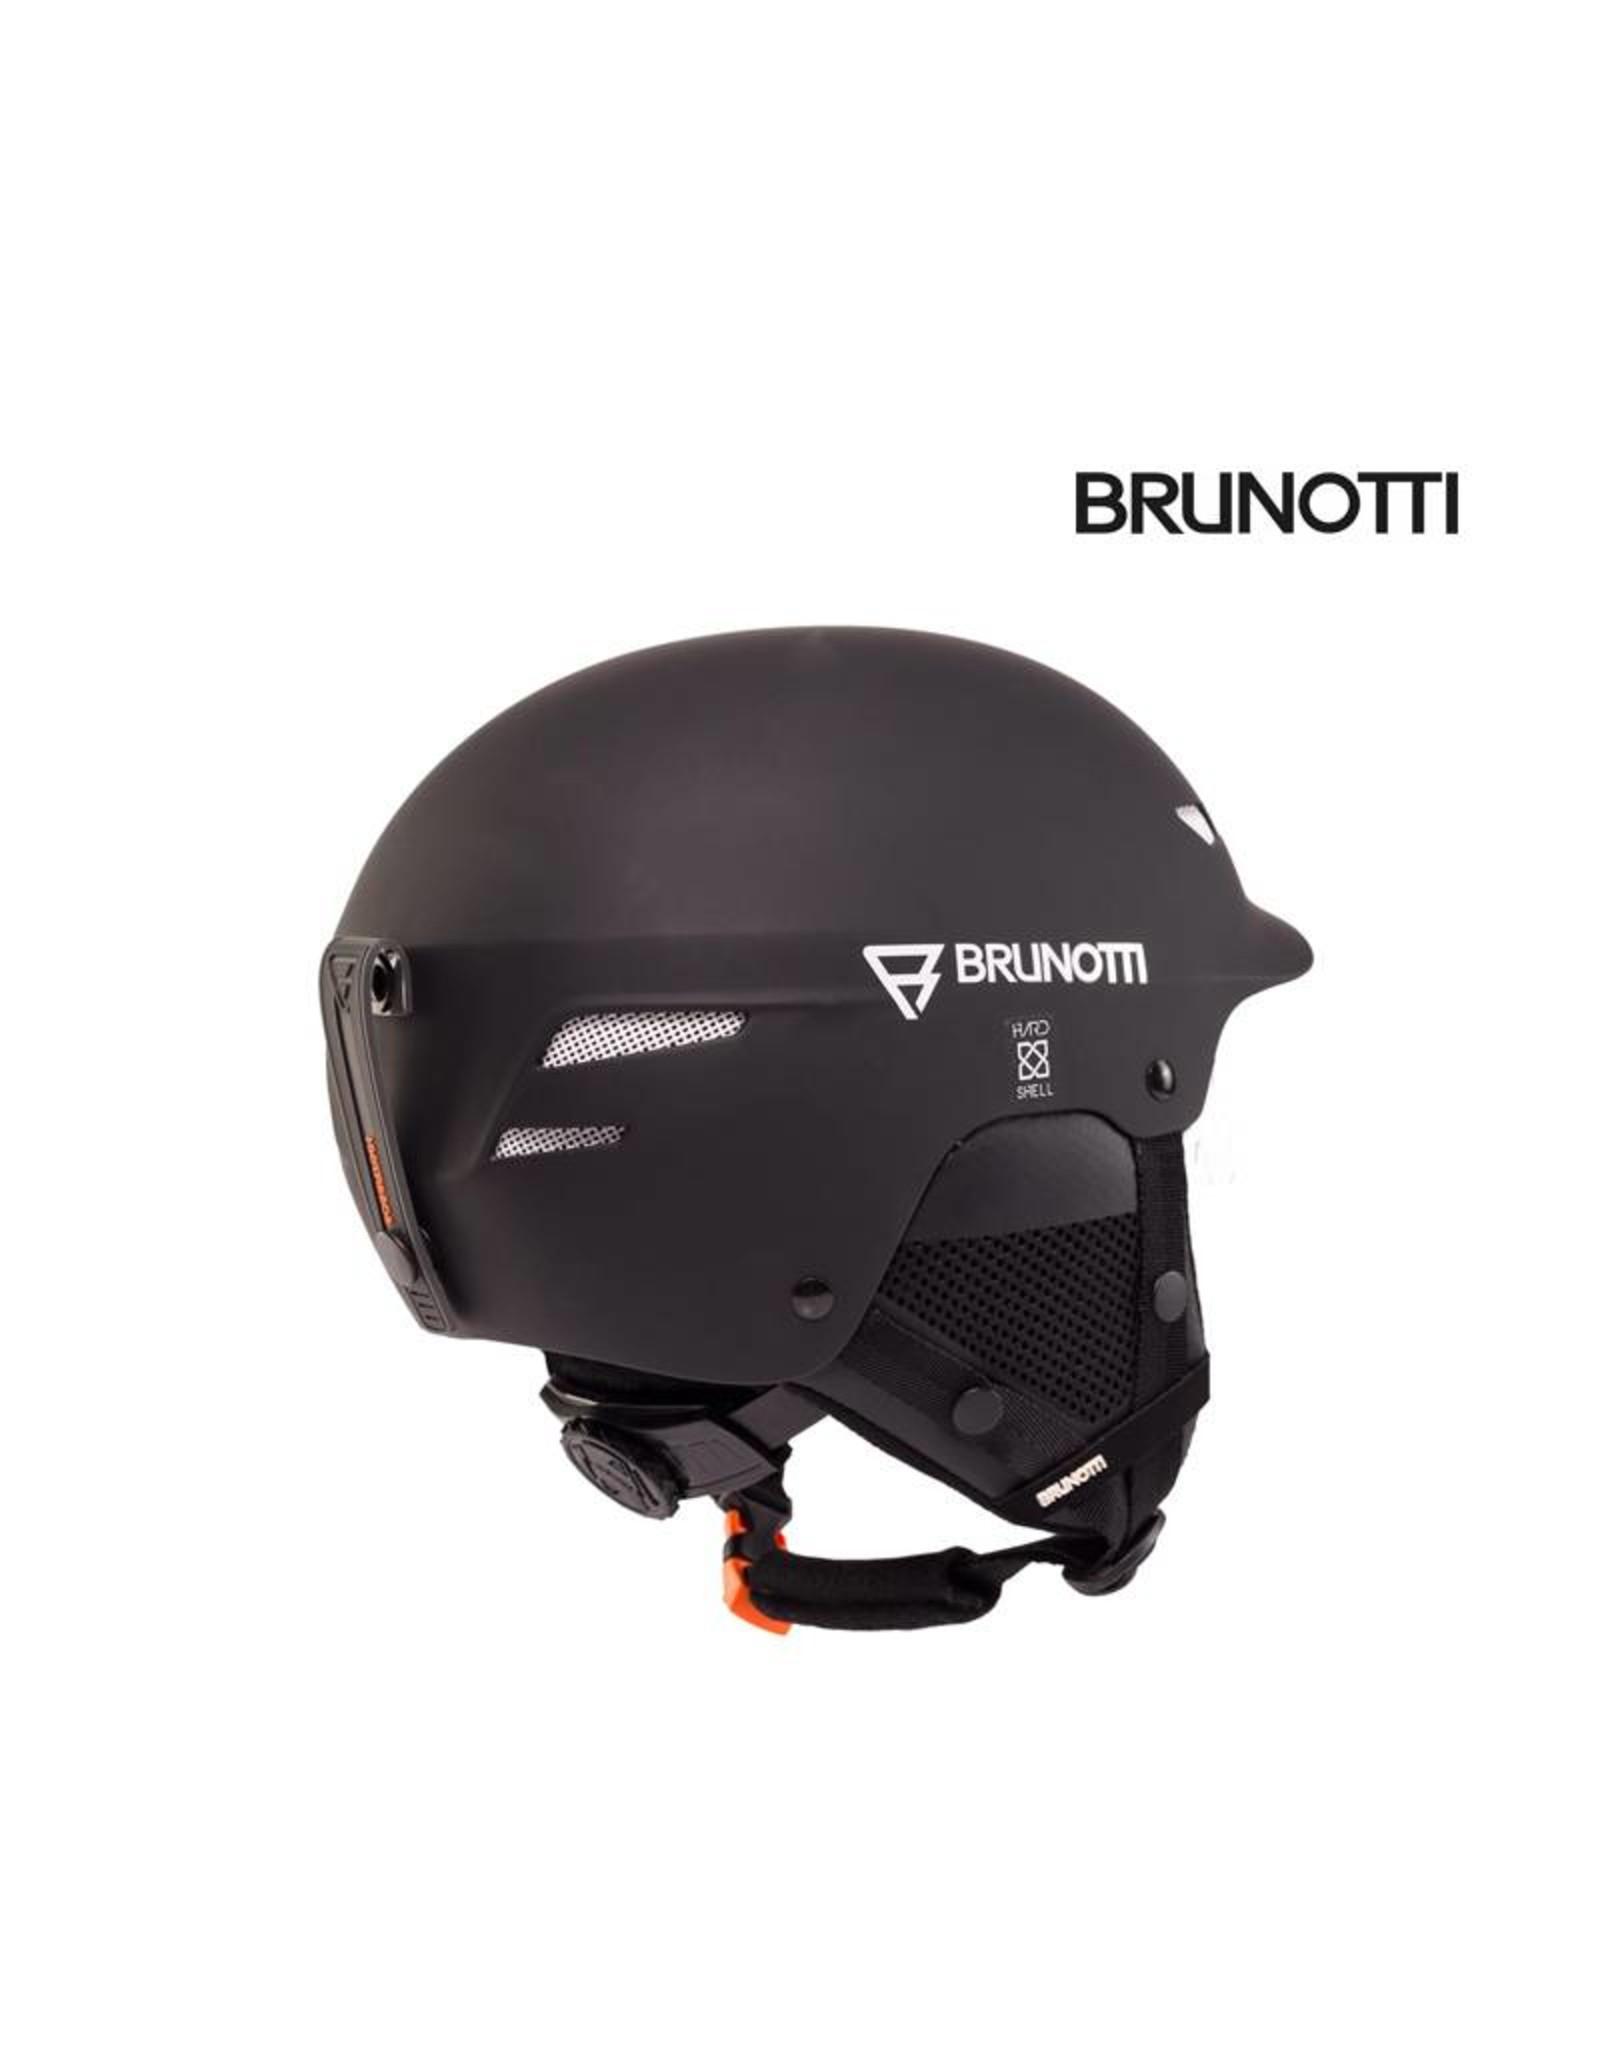 BRUNOTTI Helm Brunotti Proxima 4 53/56 Kids Black